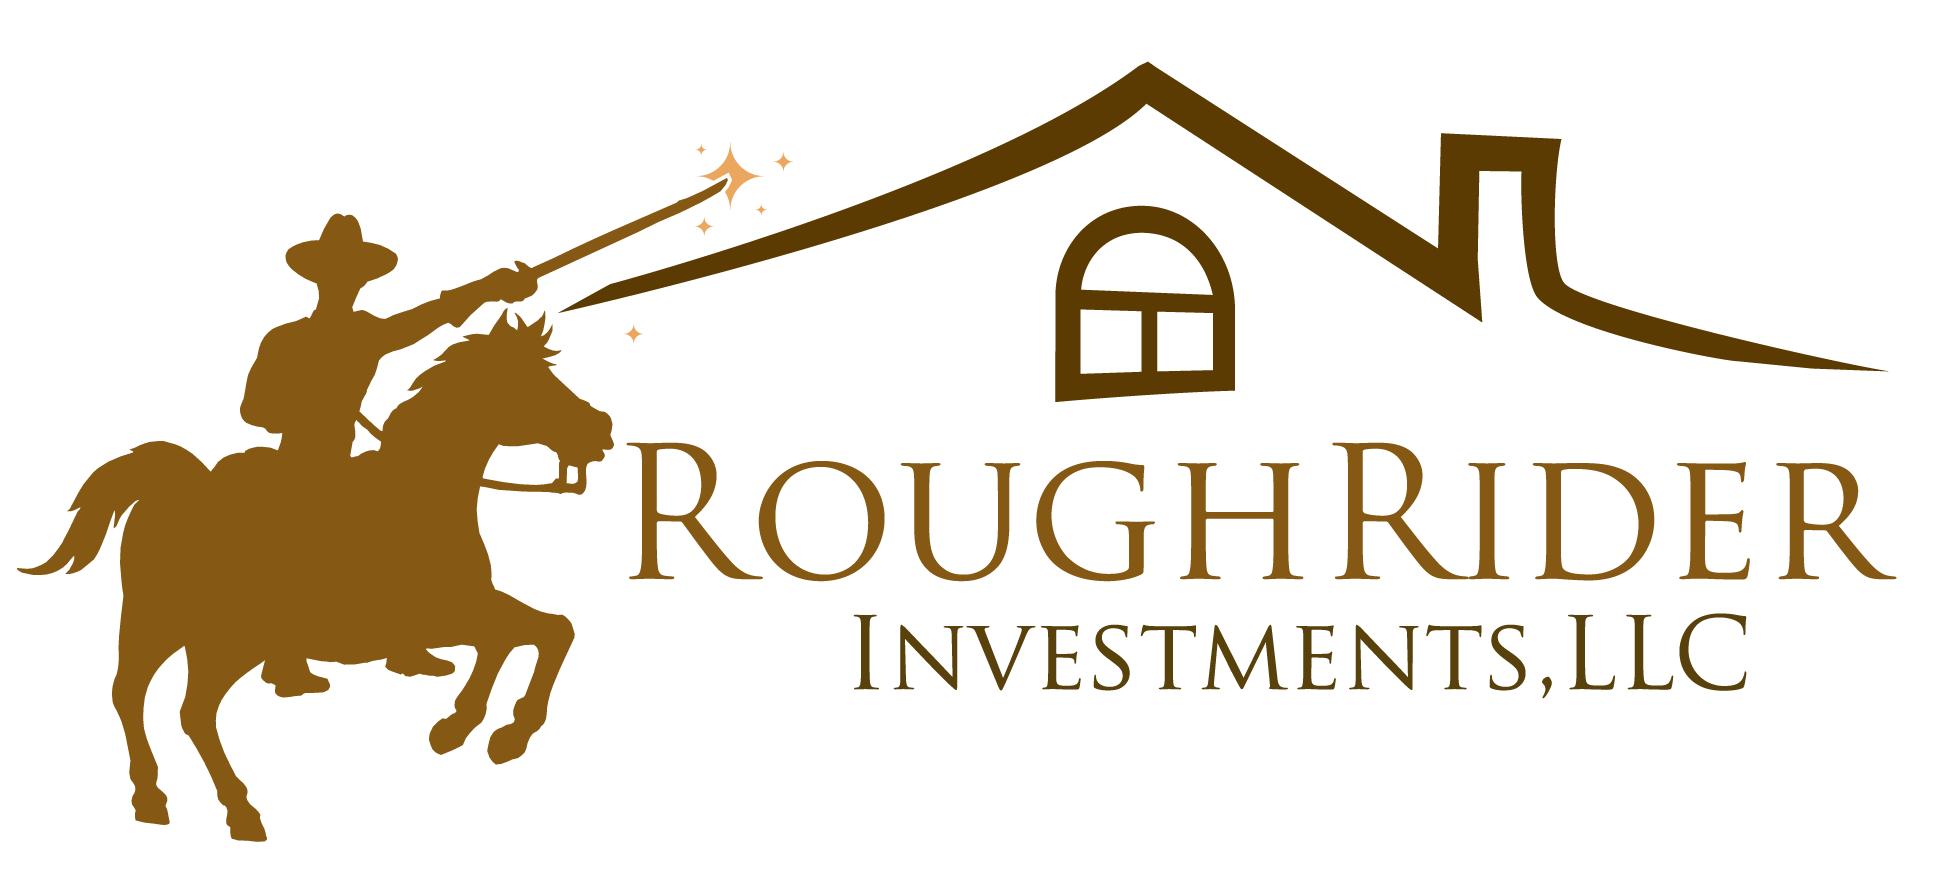 Rough Rider Investments, LLC